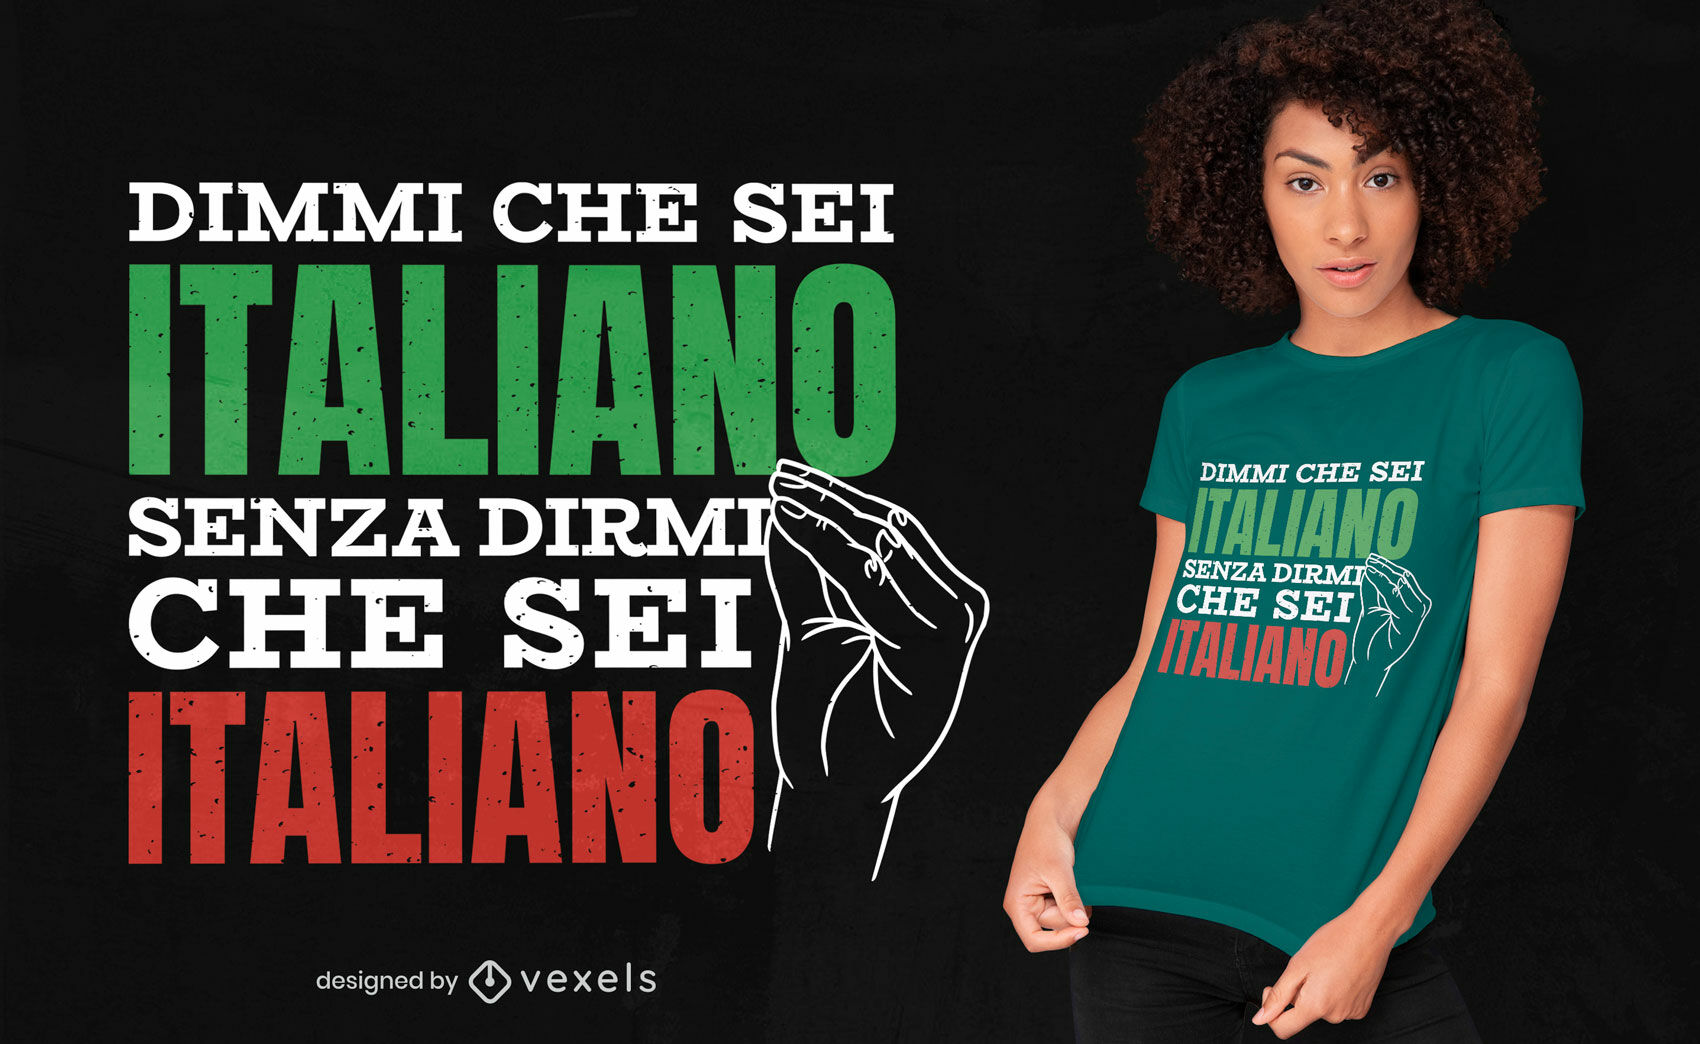 Italian hand gesture t-shirt design